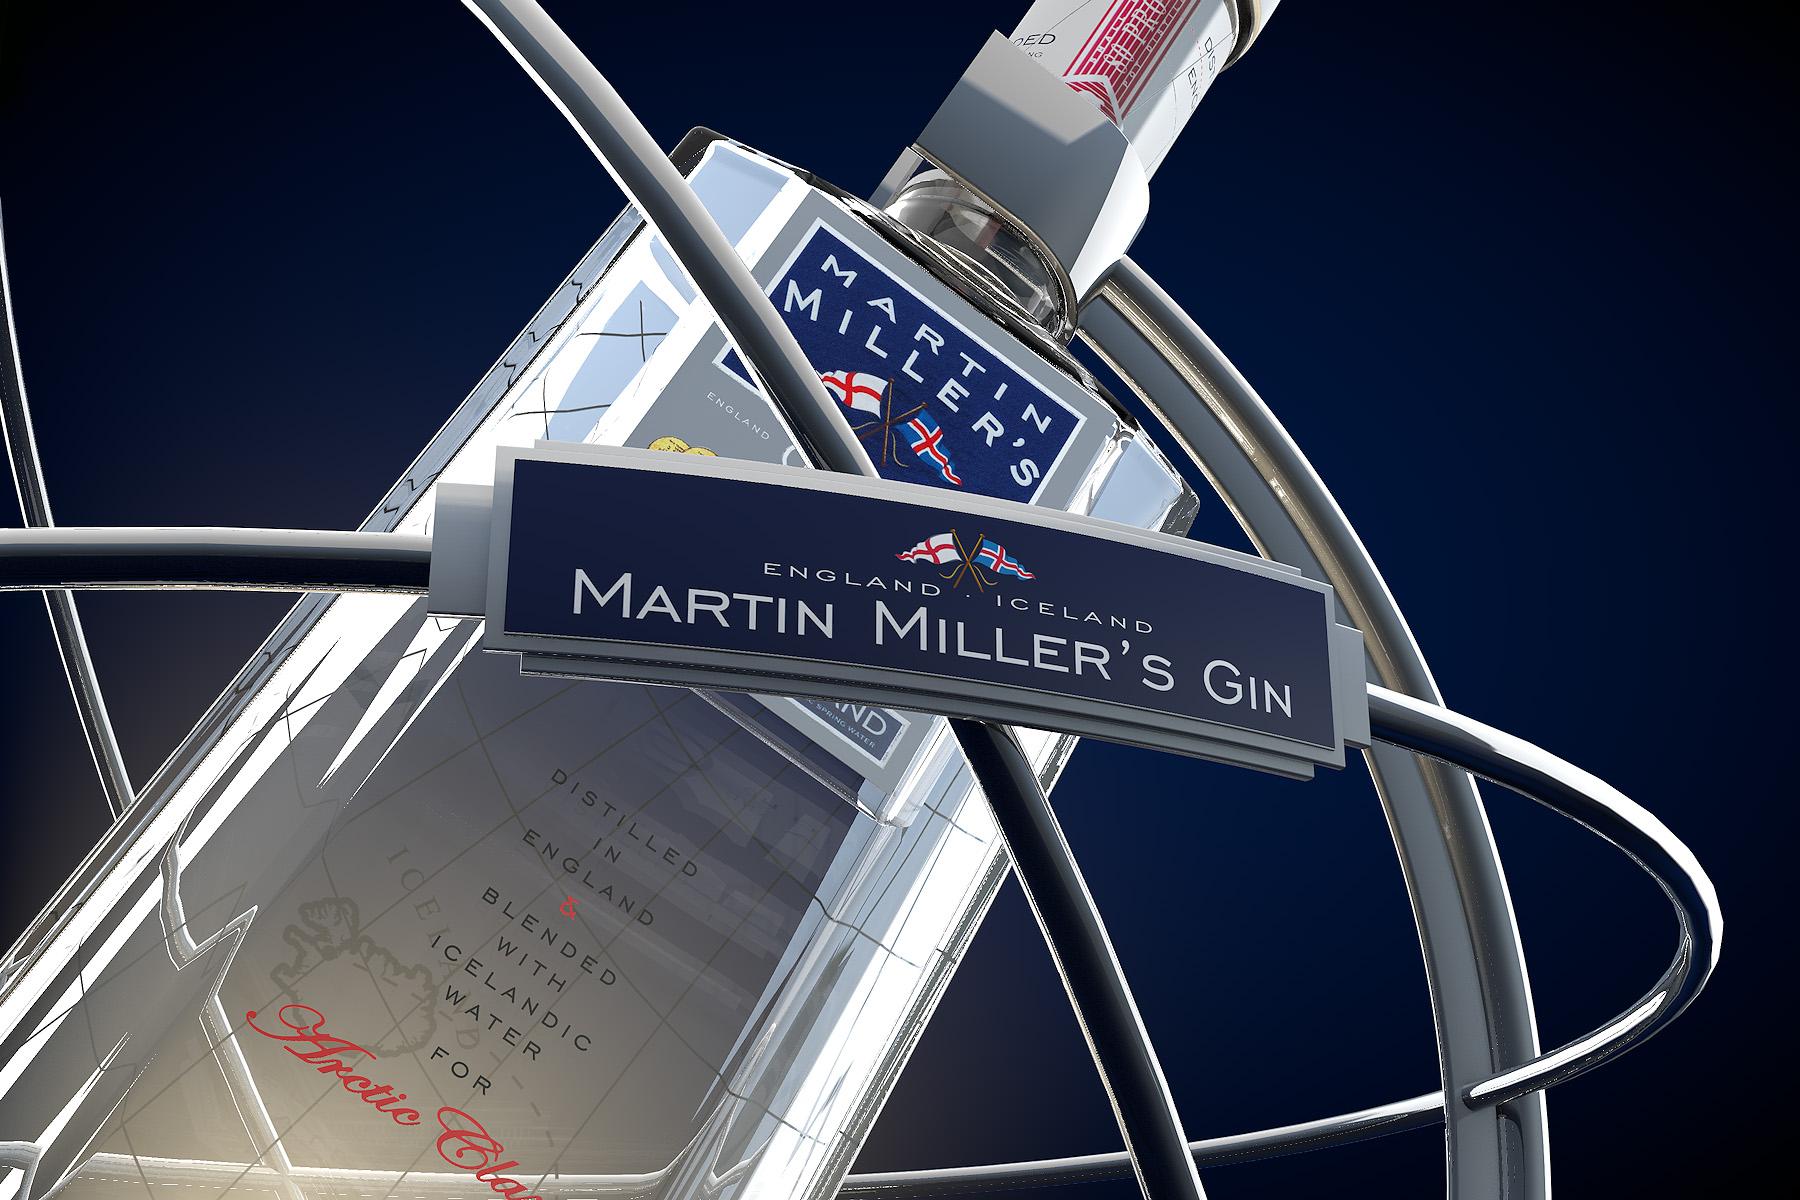 Martin Miller's Gin Key Visual